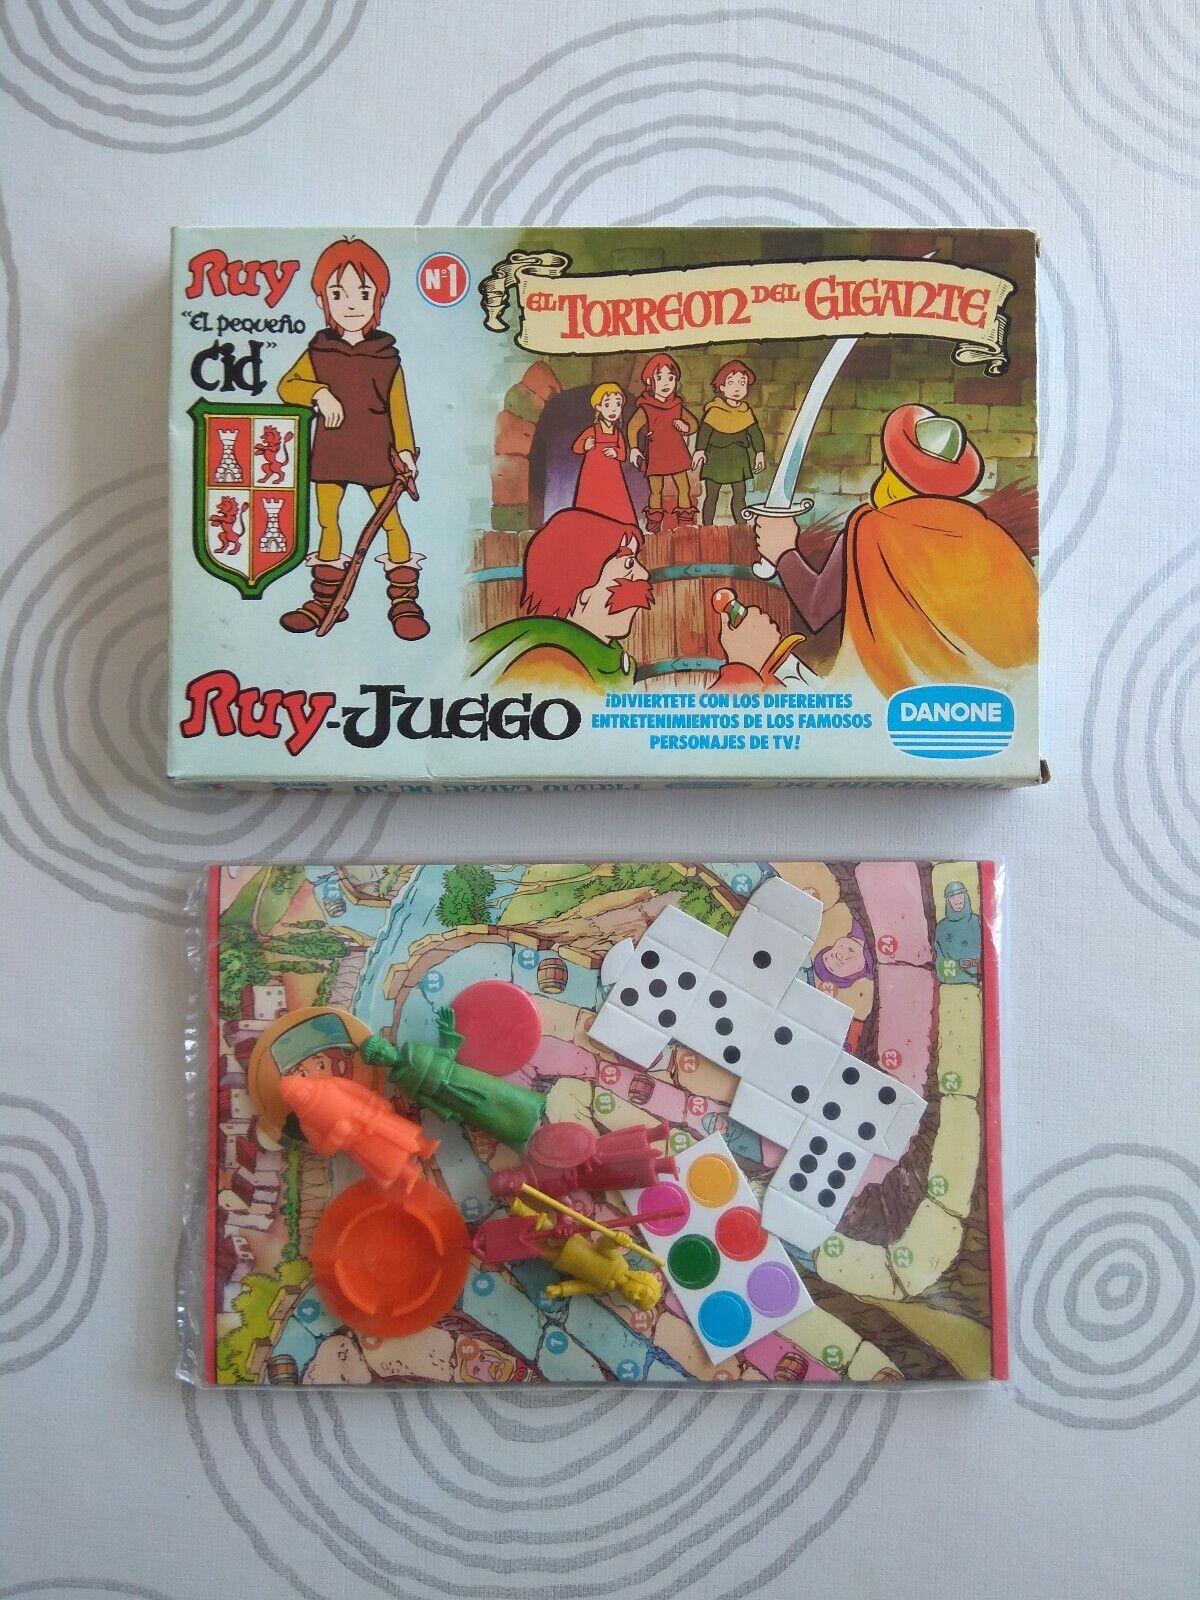 Dunkin ruy petit CID-Danone game no. 1  the heart of the Giant-unopened  magasin fait l'achat et la vente